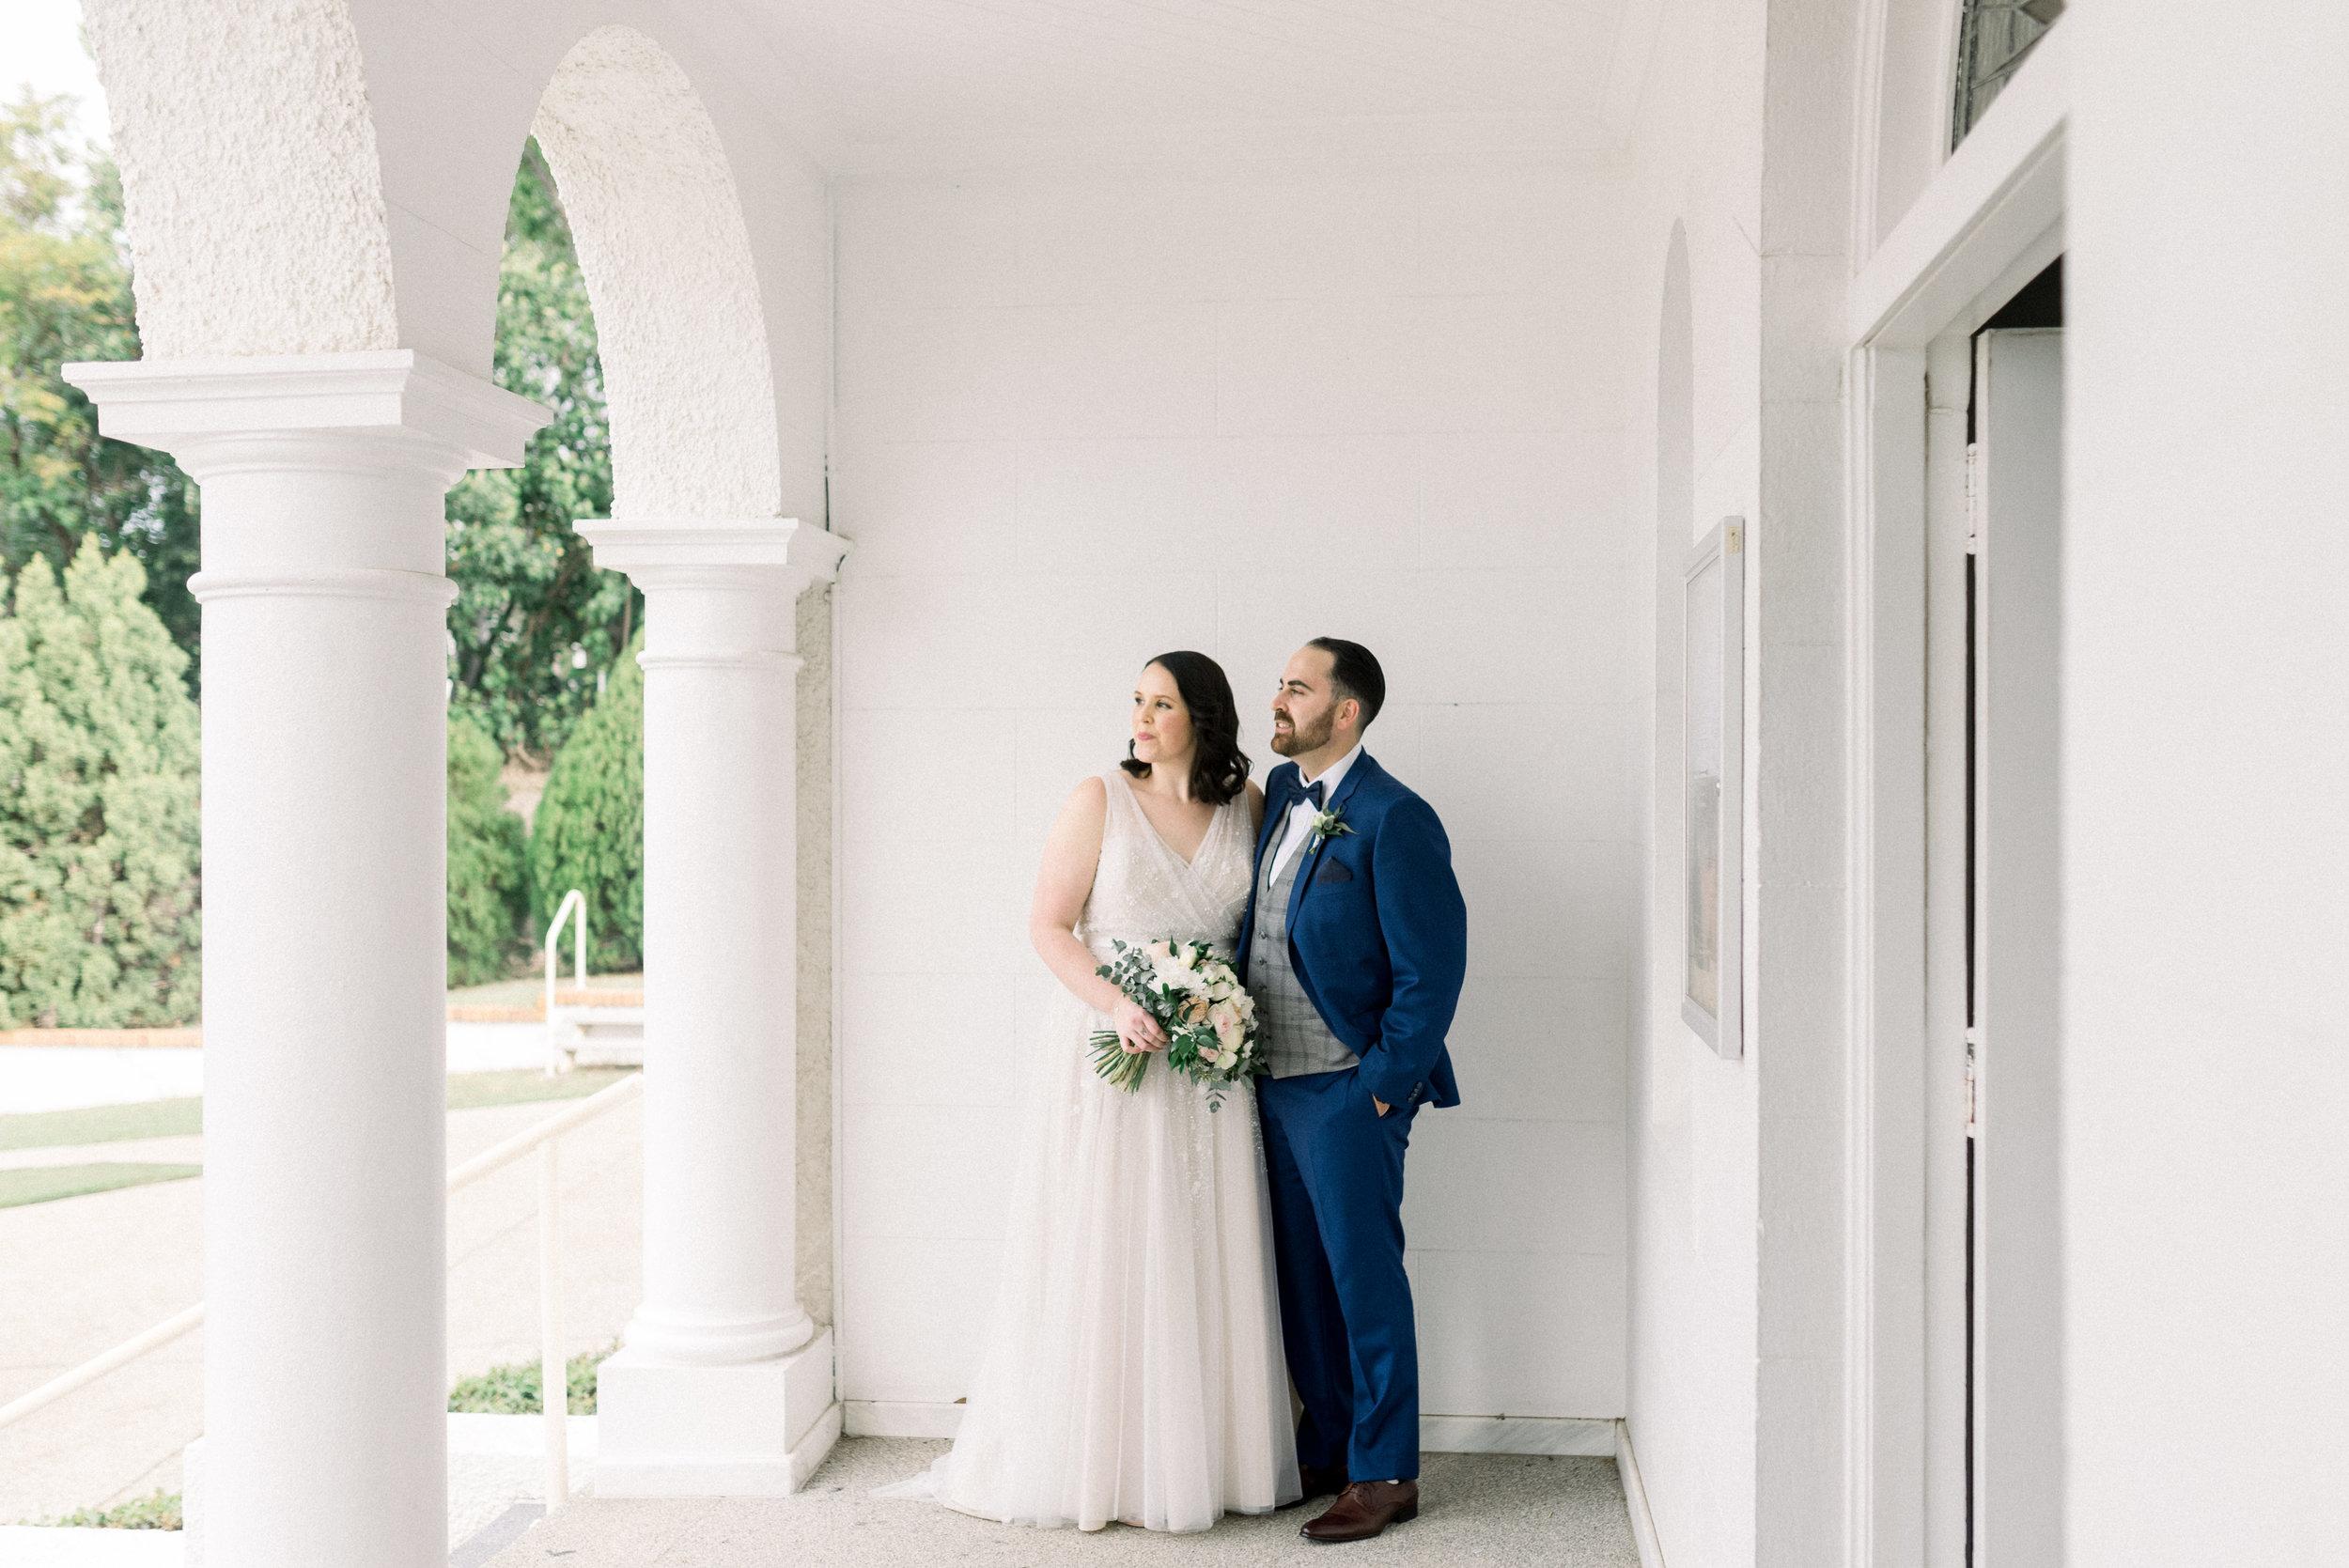 brisbane-city-wedding-photographer-romantic-wedding-50.jpg